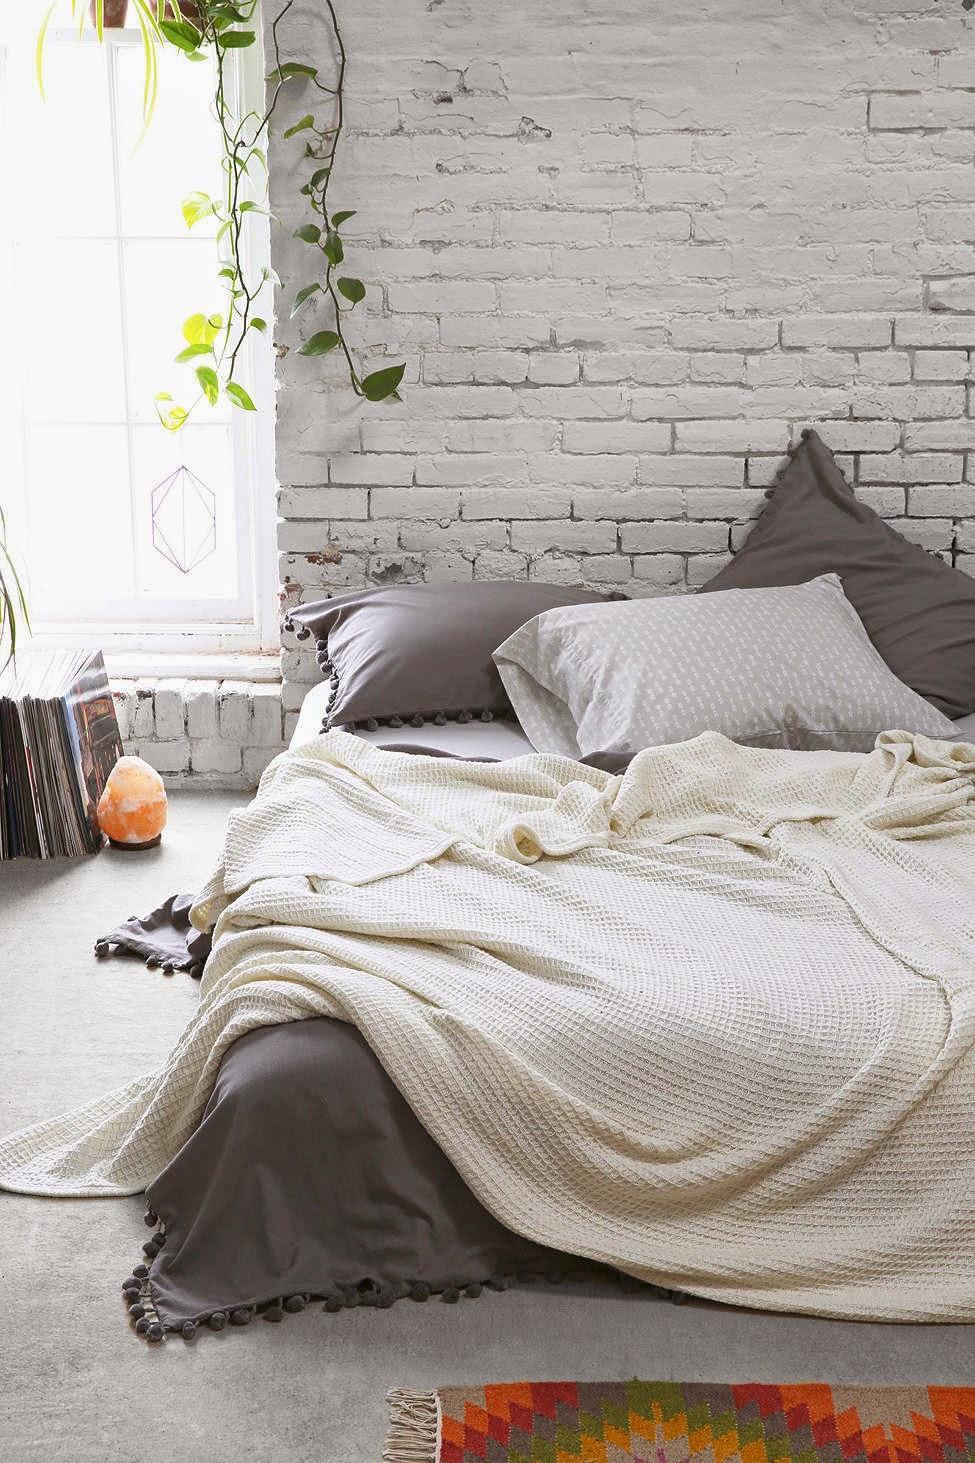 40 Minimalist Bedroom Ideas | Less is More | Homelovr on Minimalist Bedroom Ideas  id=87146